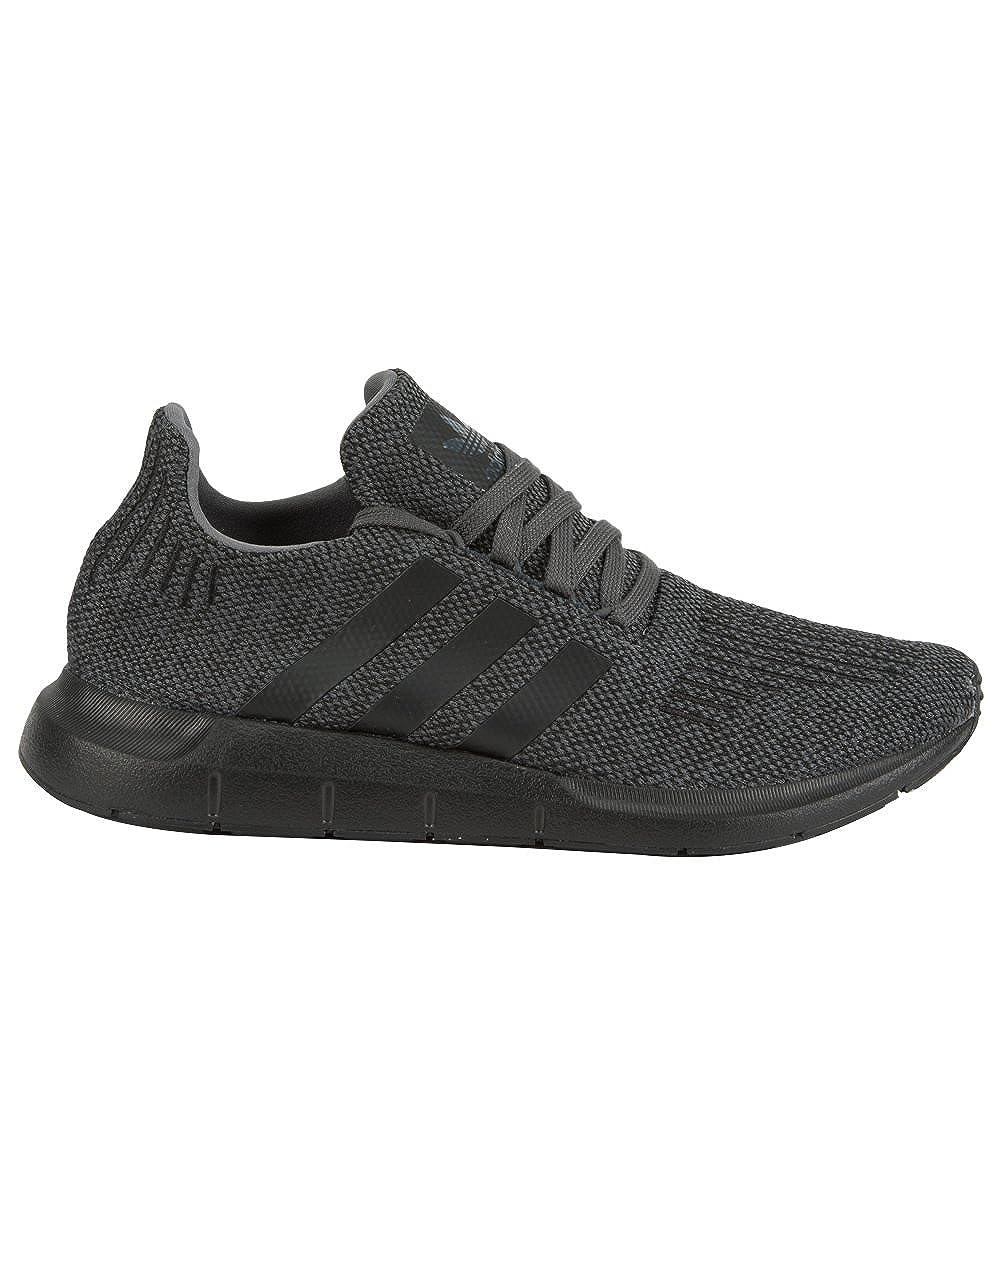 adidas Mens SWIFT RUN M Grey Black Black – AC7164 Grey Five Core Black, 8 D M US